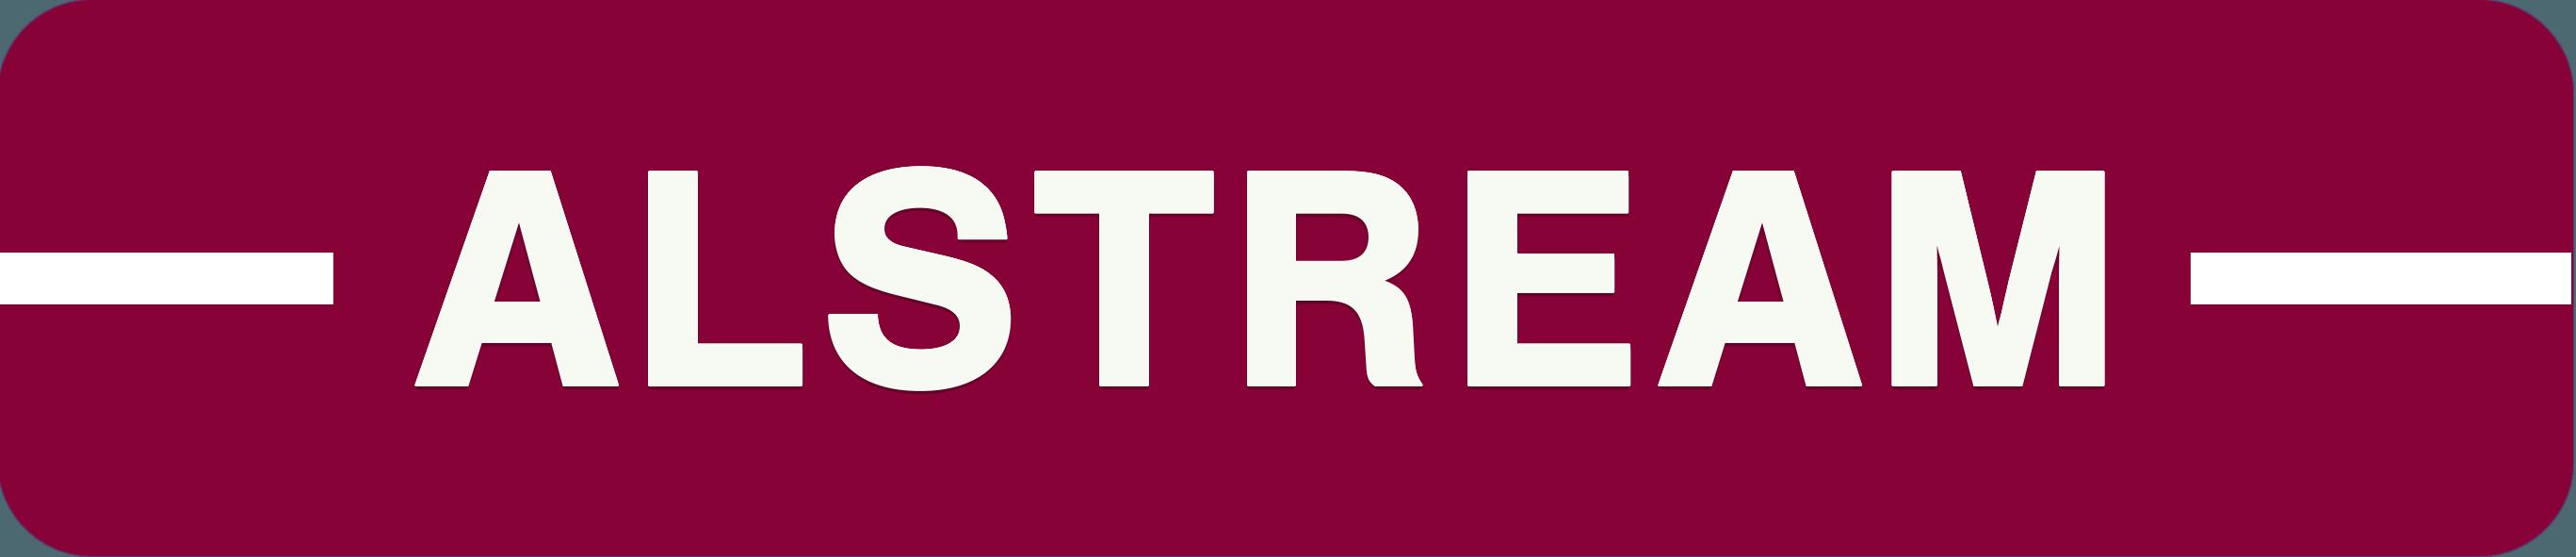 Alstream